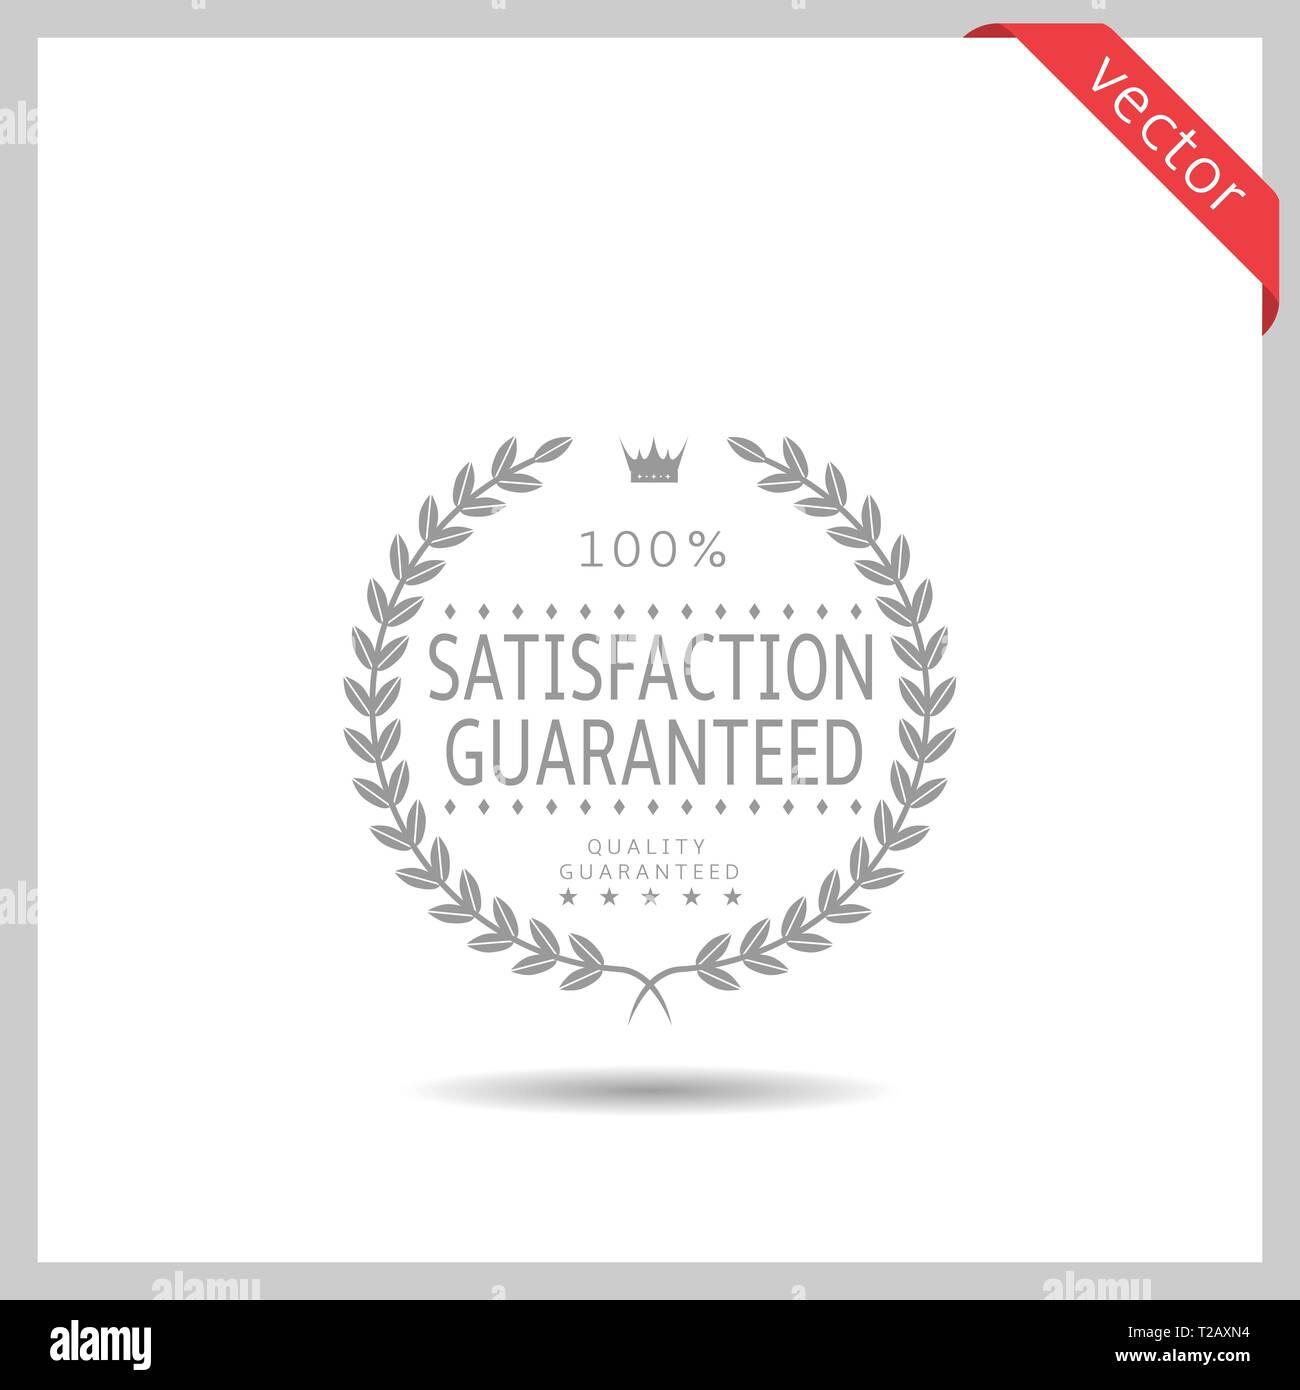 Satisfaction guaranteed icon. Laurel wreath label badge isolated, Vector illustration - Stock Vector